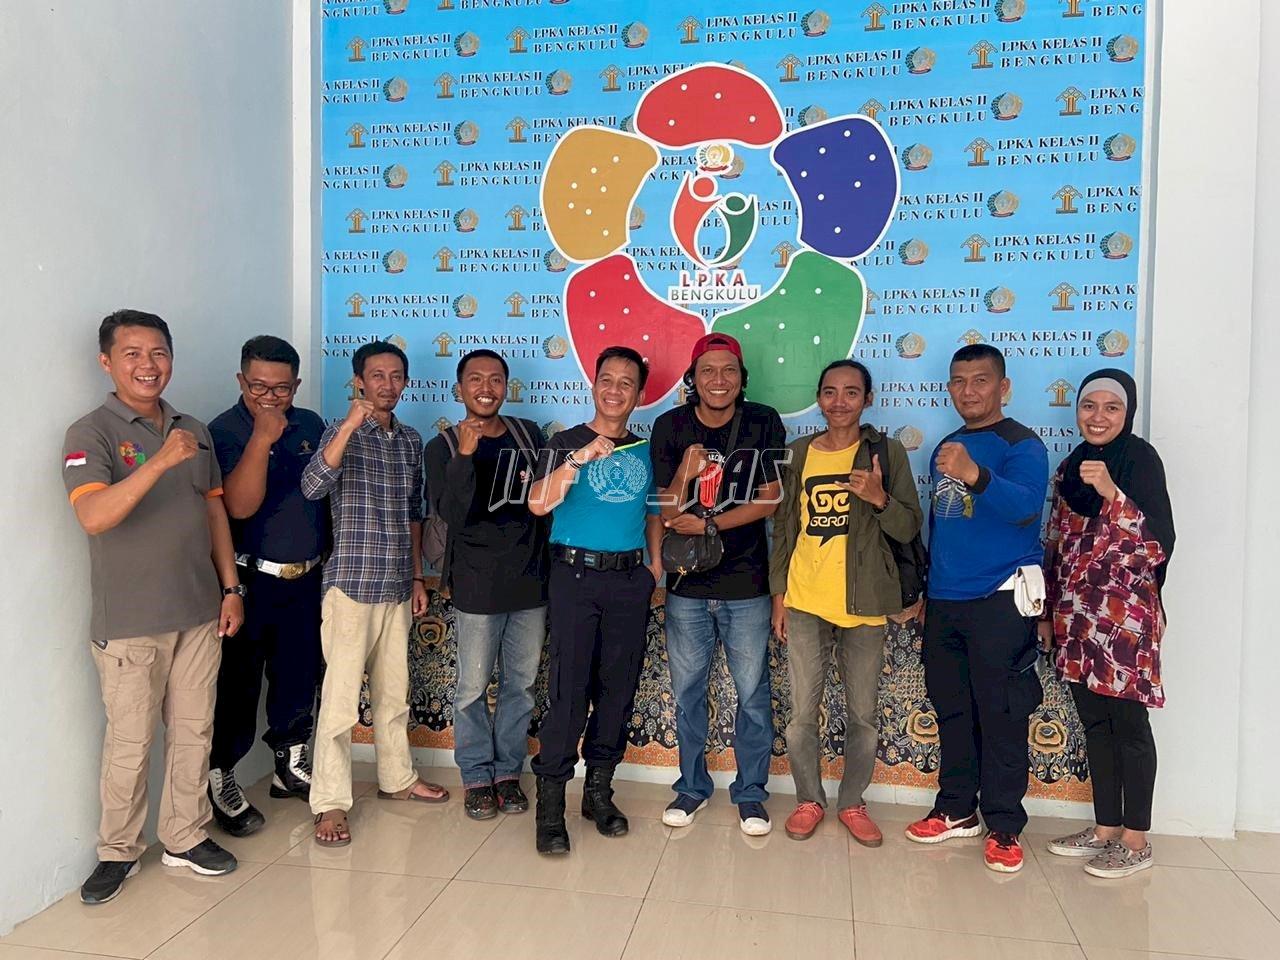 Crew Konakito Café Serahkan Hasil Lelang Karya Anak LPKA Bengkulu